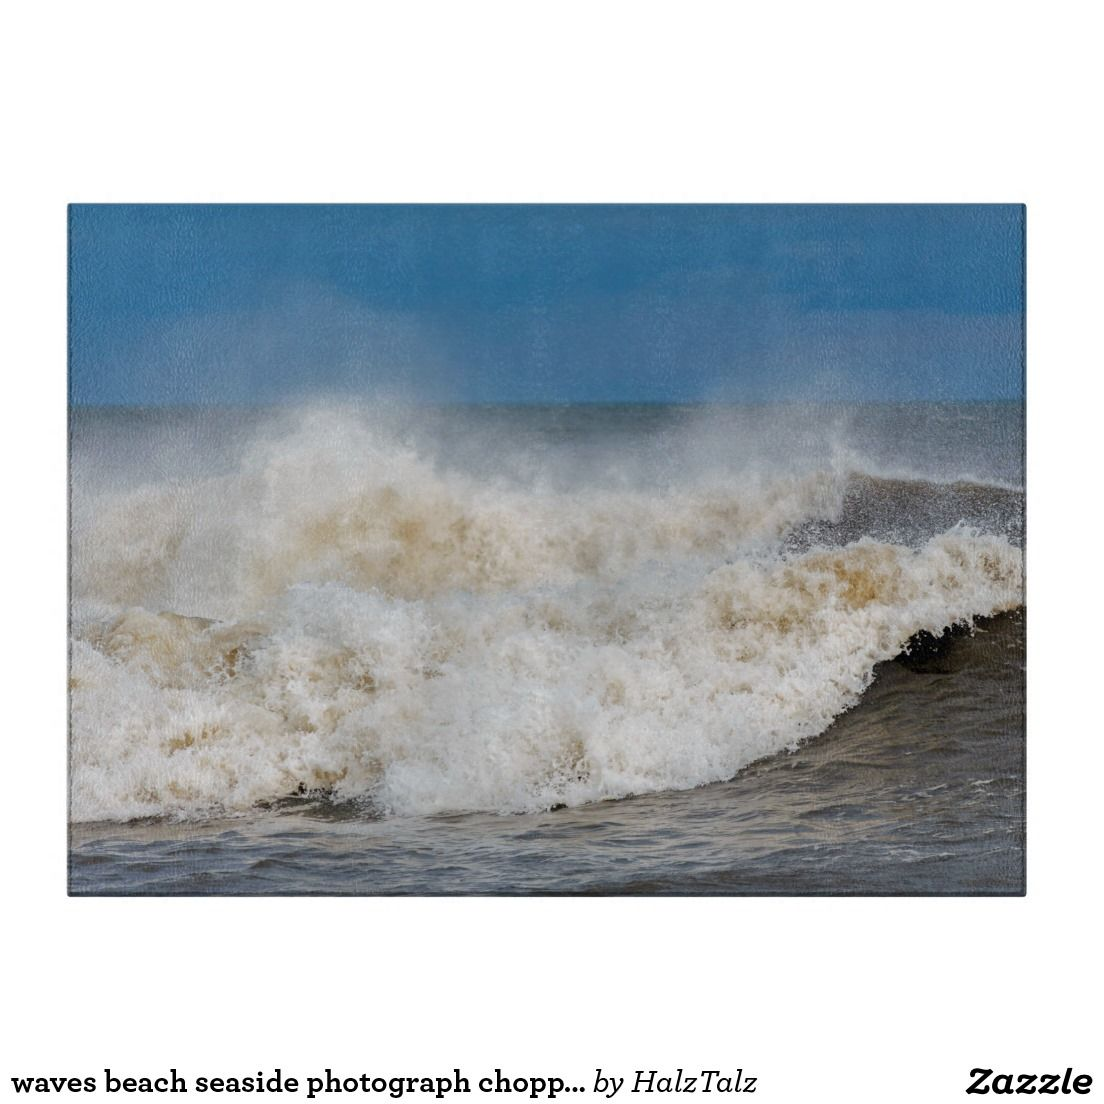 Waves Beach Seaside Photograph Chopping Board Cutting Boards